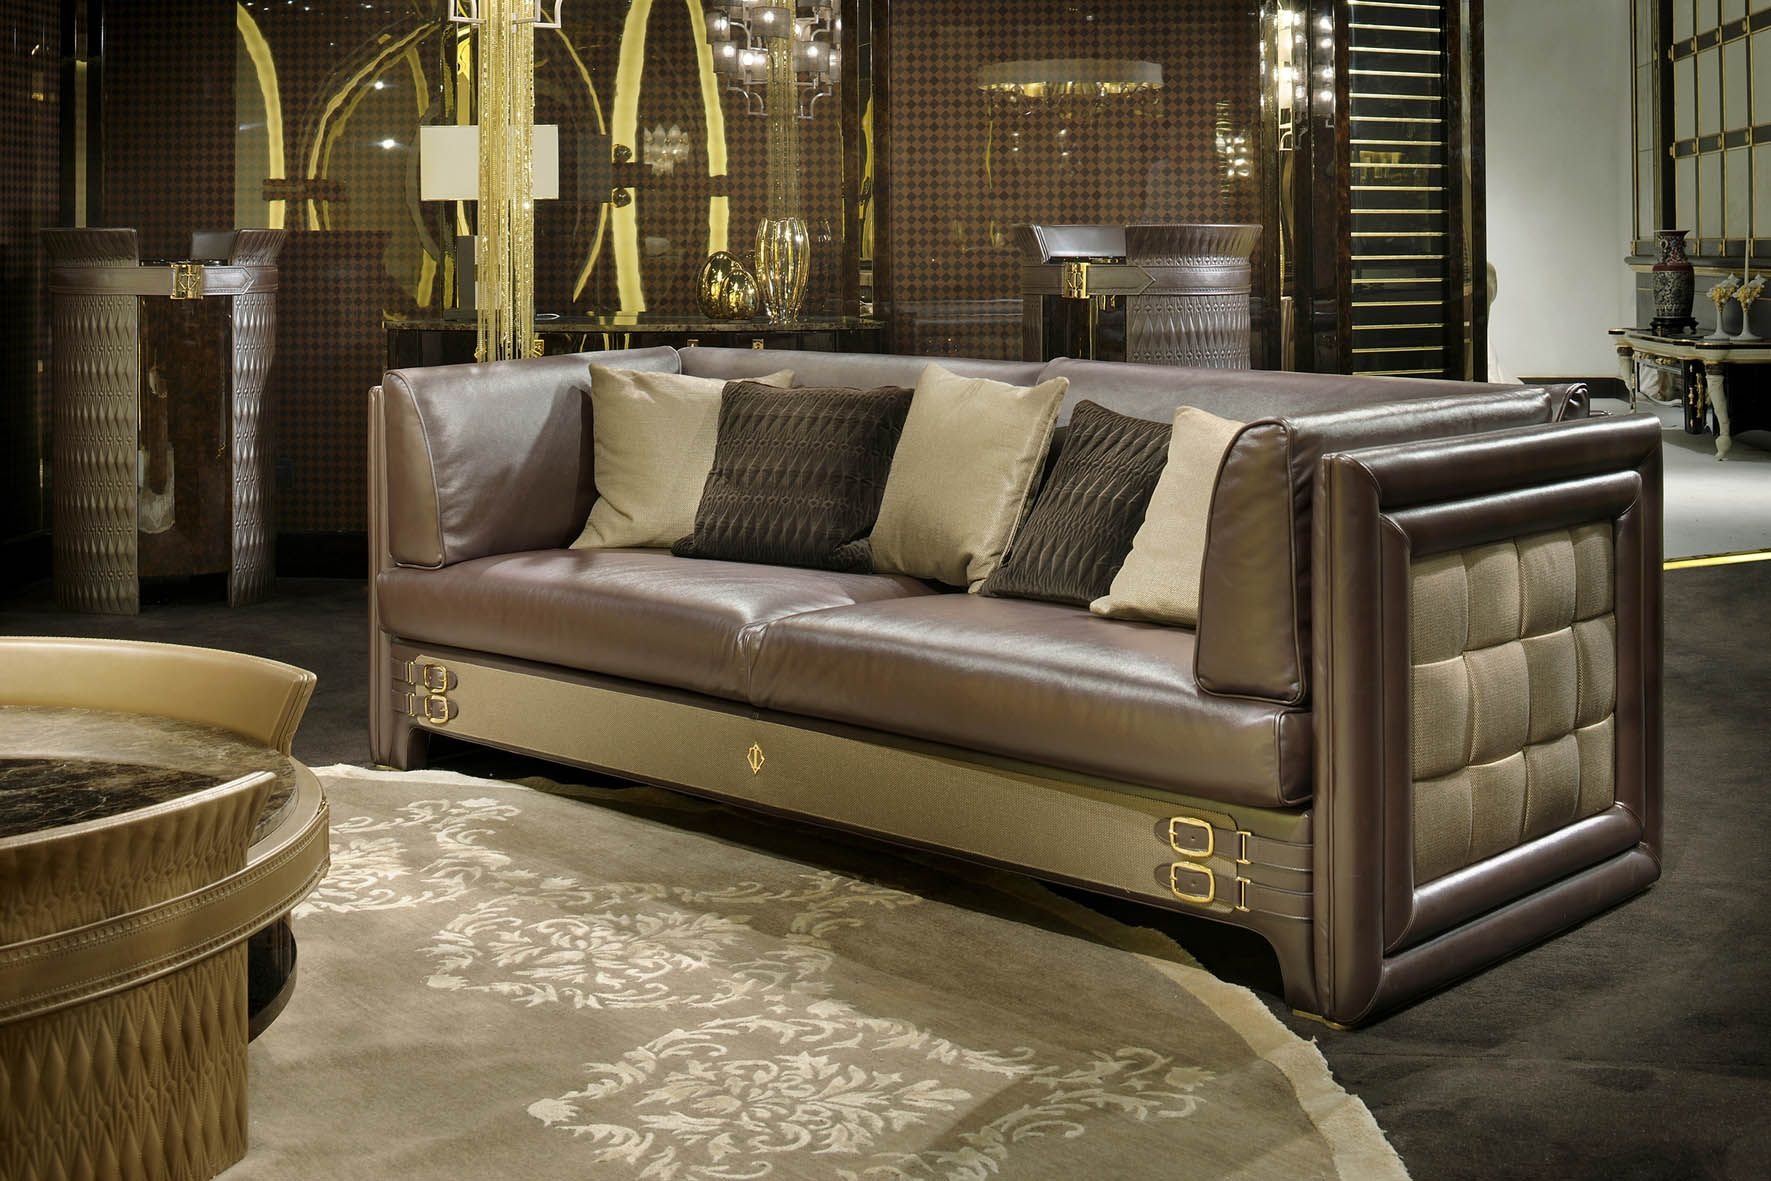 Sofa Austin Mariner Luxury Furniture & Lighting